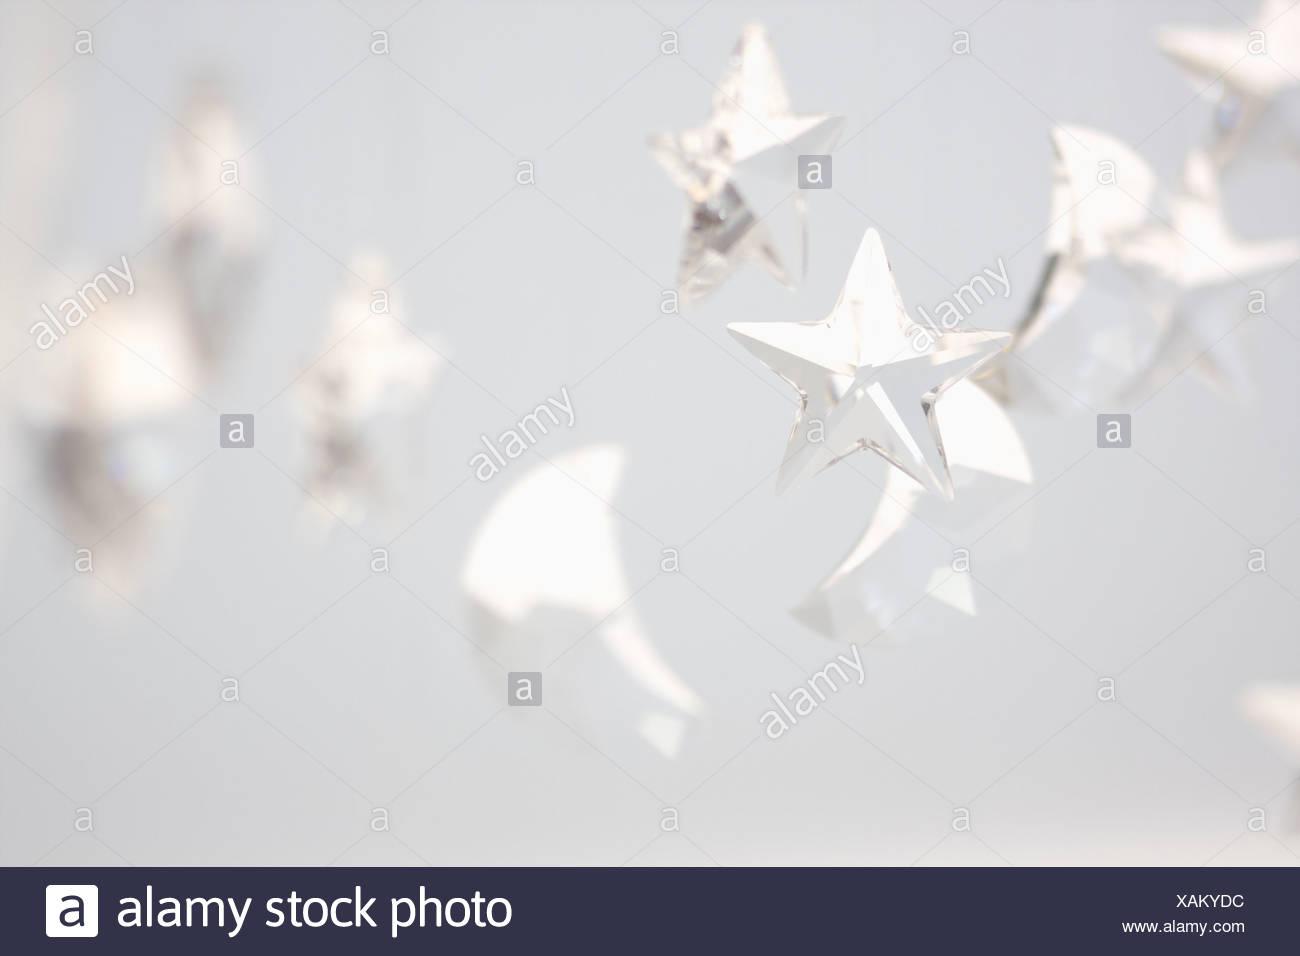 Crystalline Moon and Stars - Stock Image